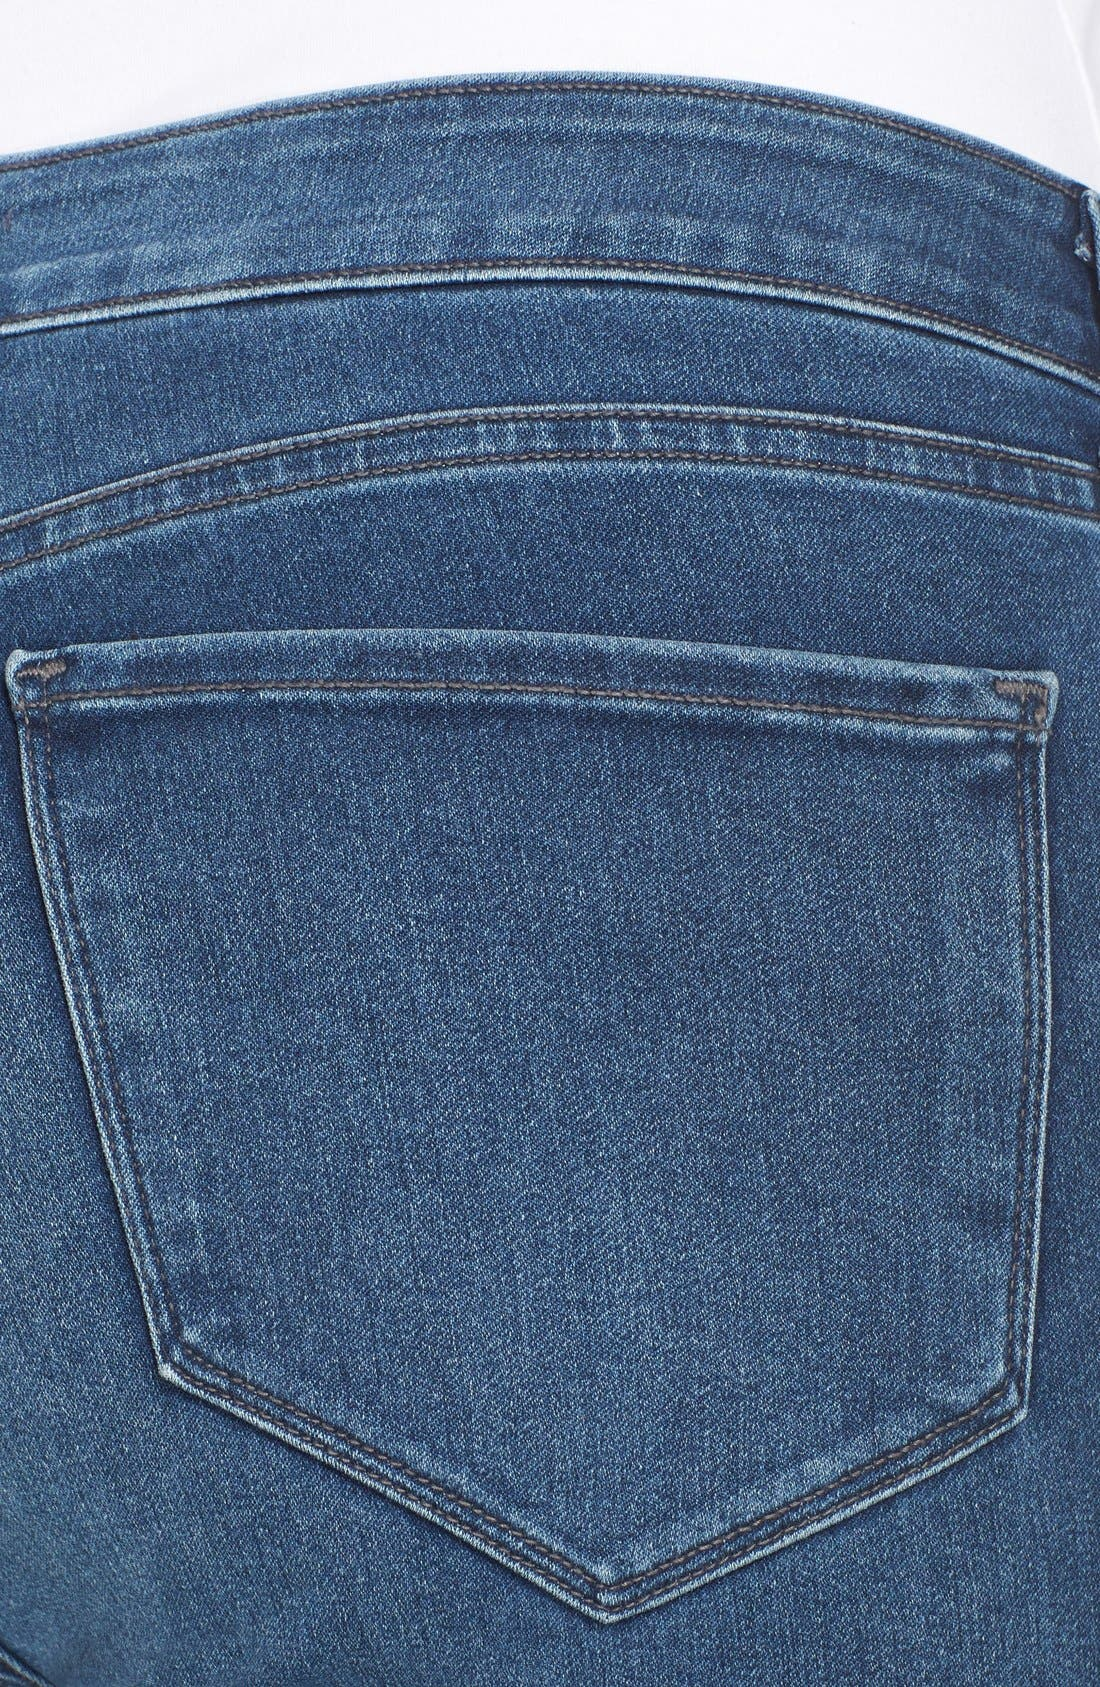 'Alina' Stretch Skinny Jeans,                             Alternate thumbnail 4, color,                             461